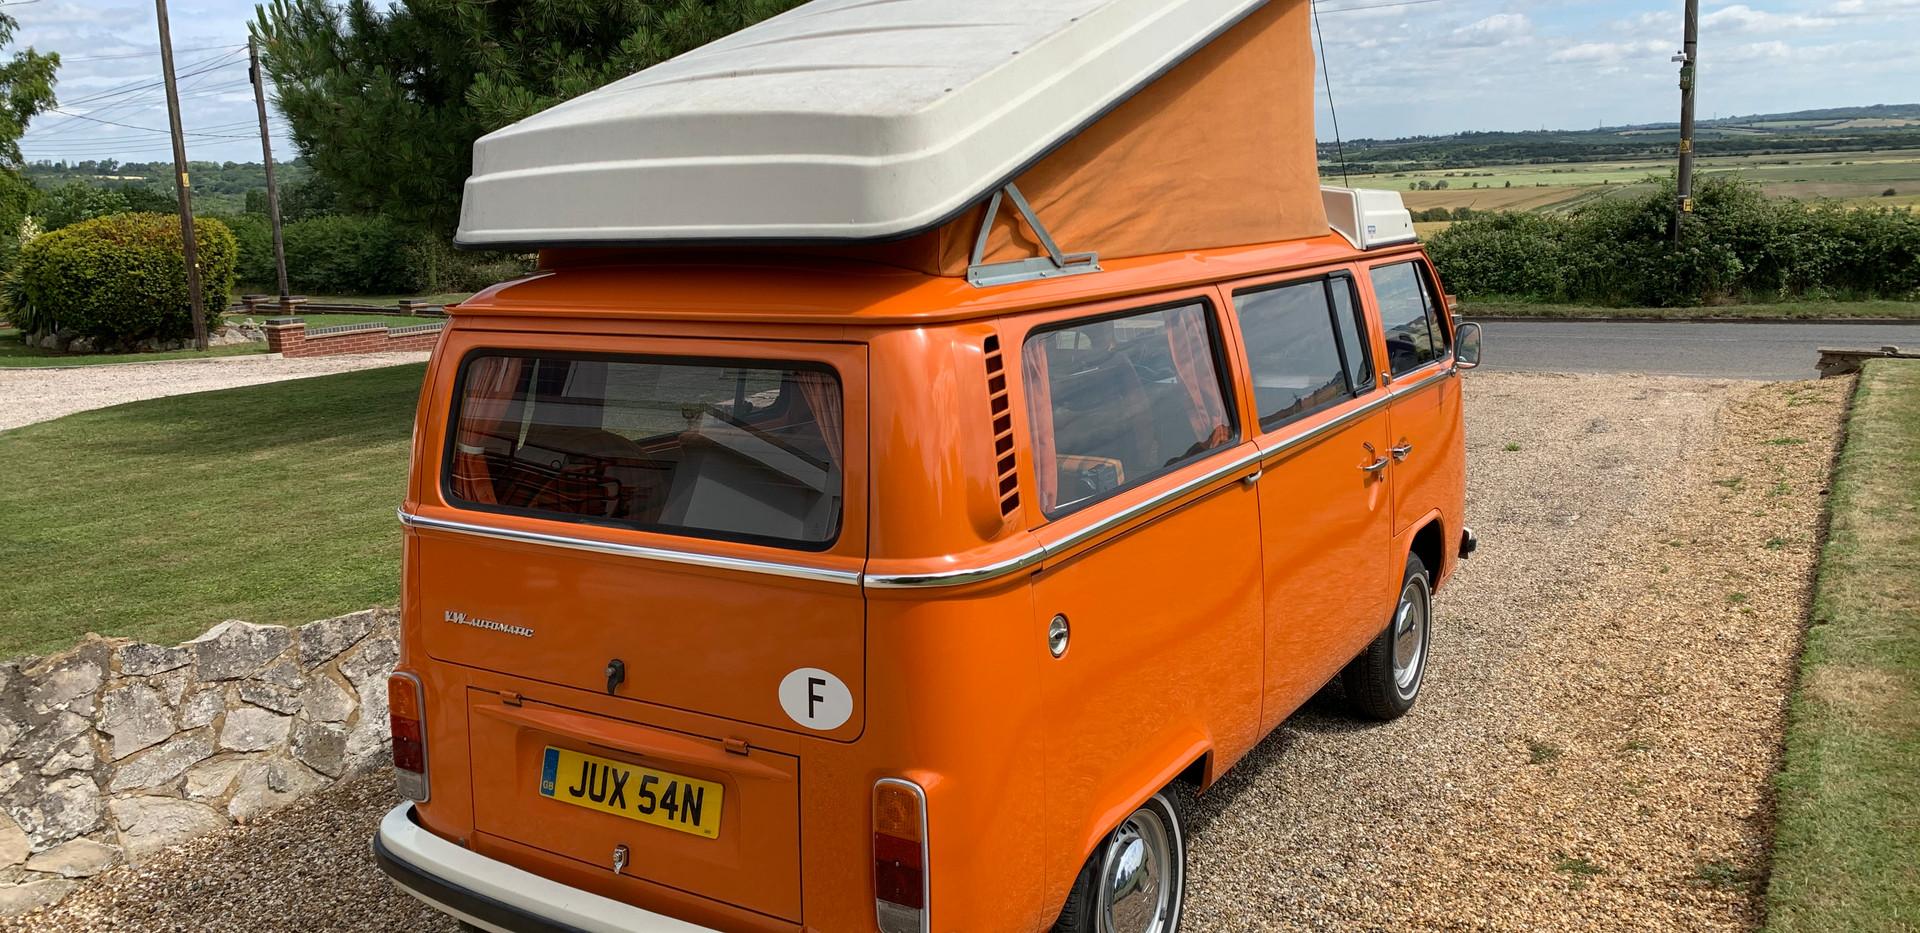 Vans for sale Essesx.jpg